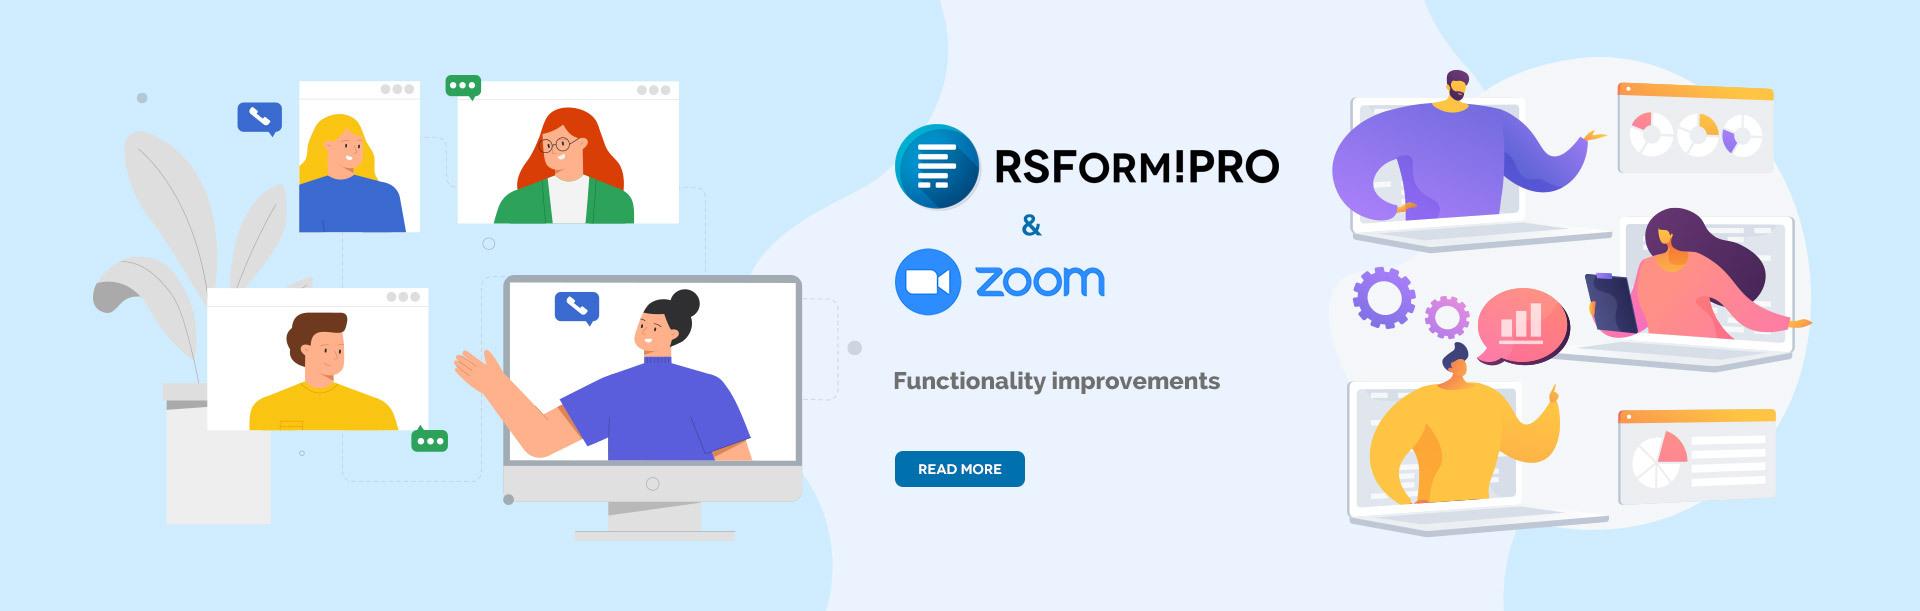 RSForm!Pro Zoom update